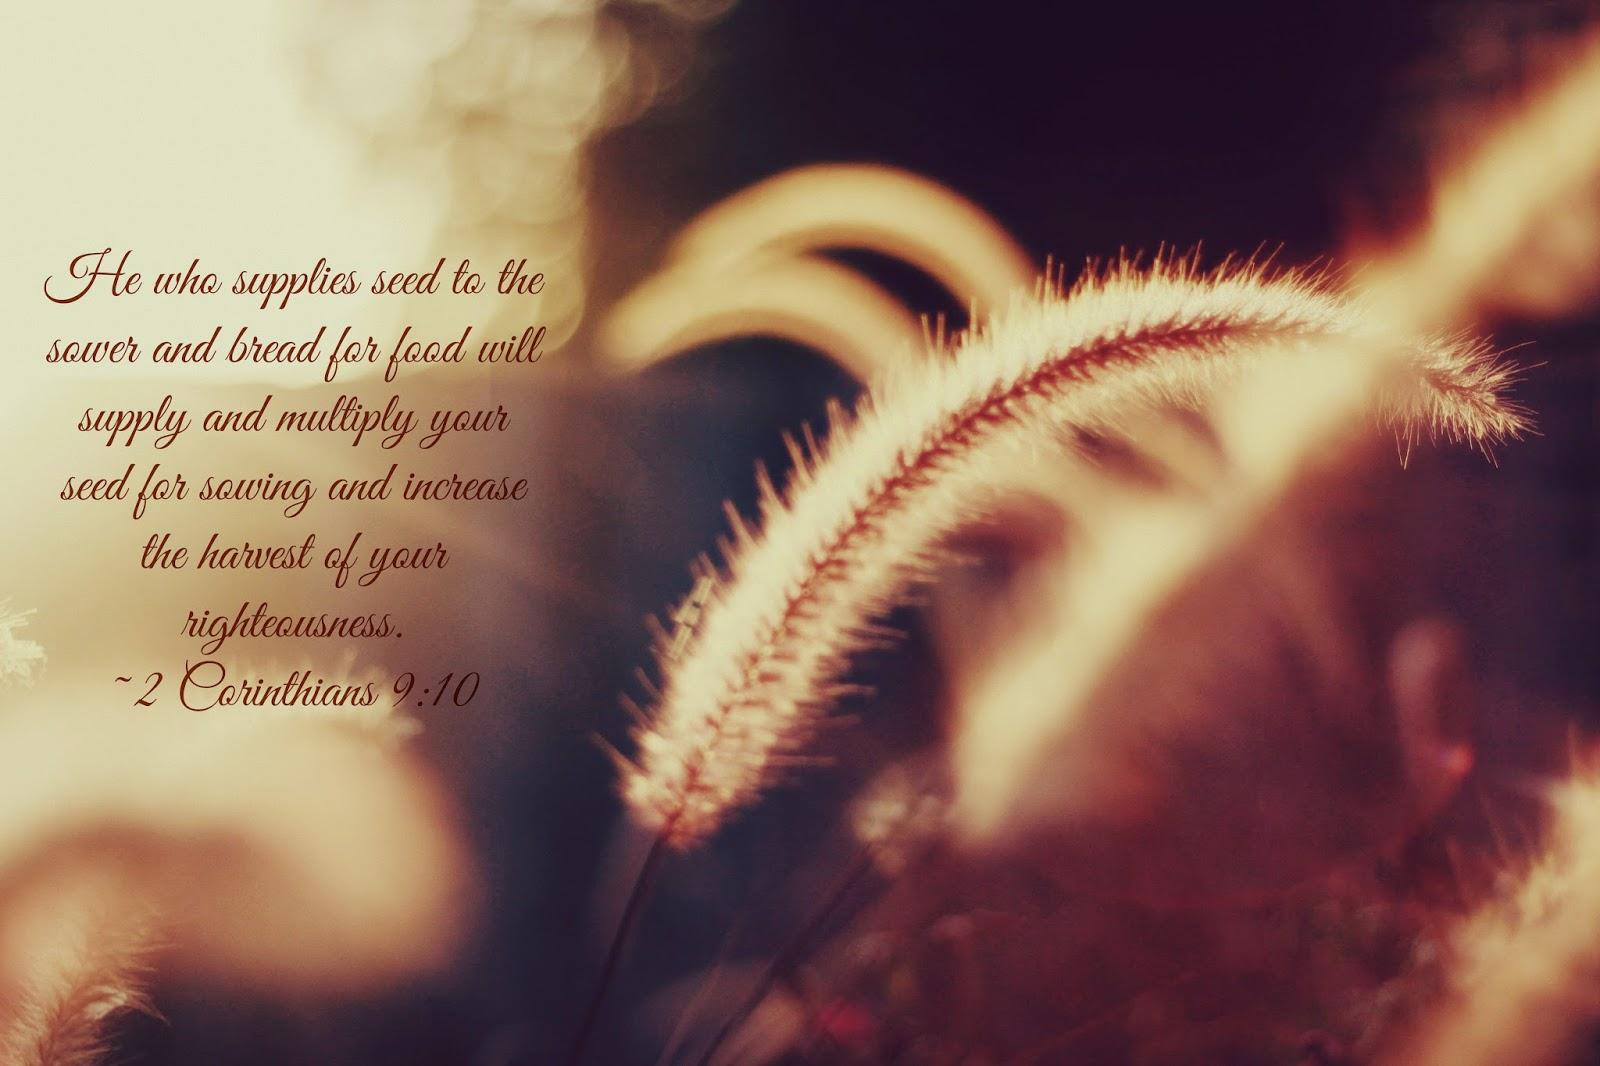 II Corinthians 9